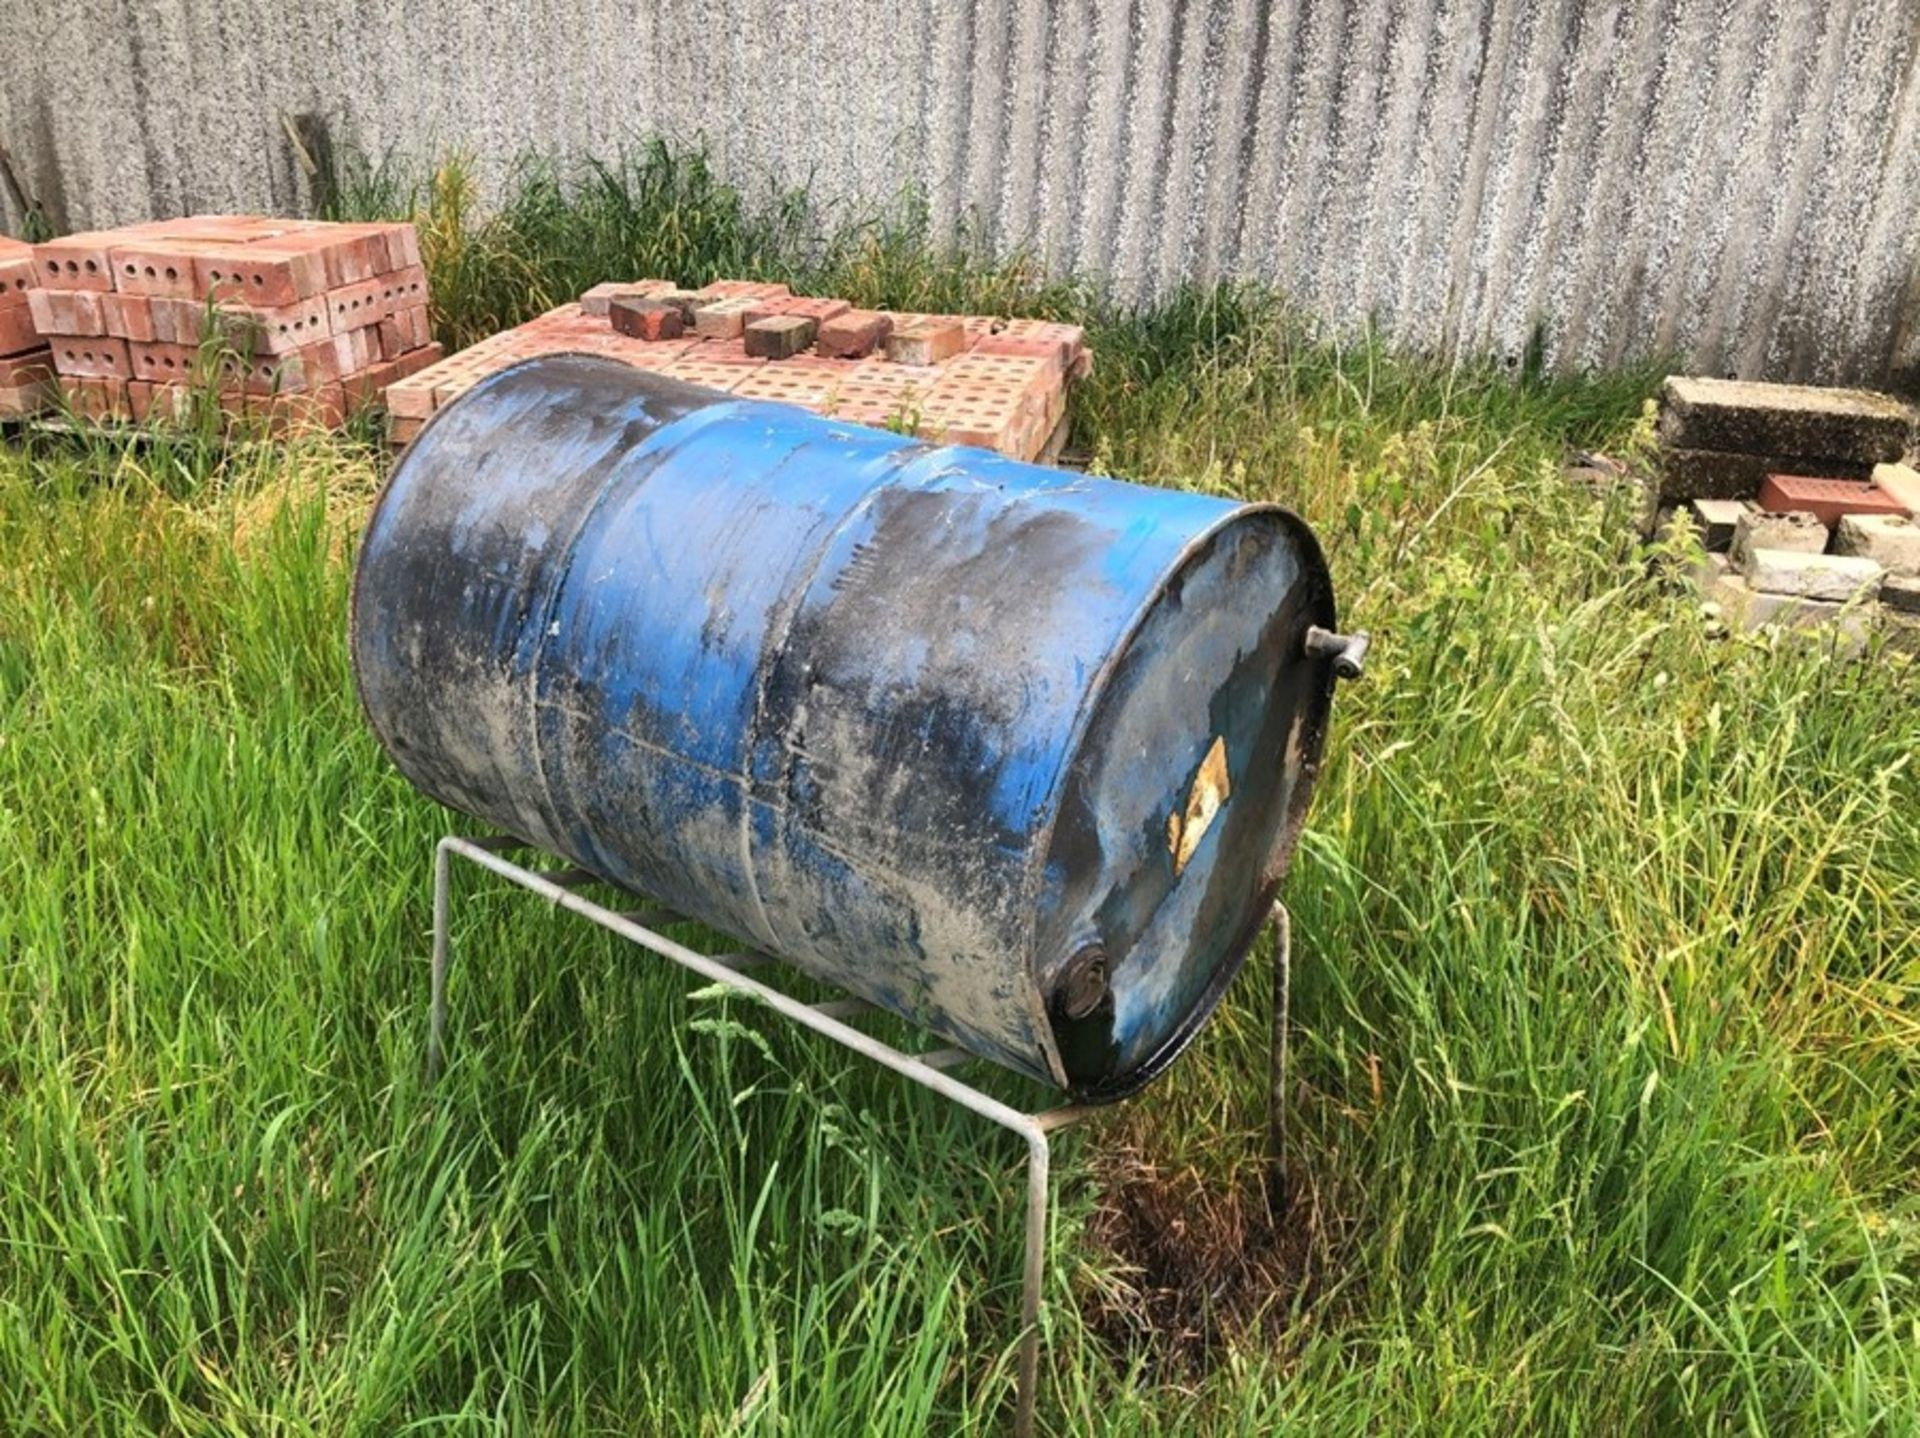 Barrel of creosote